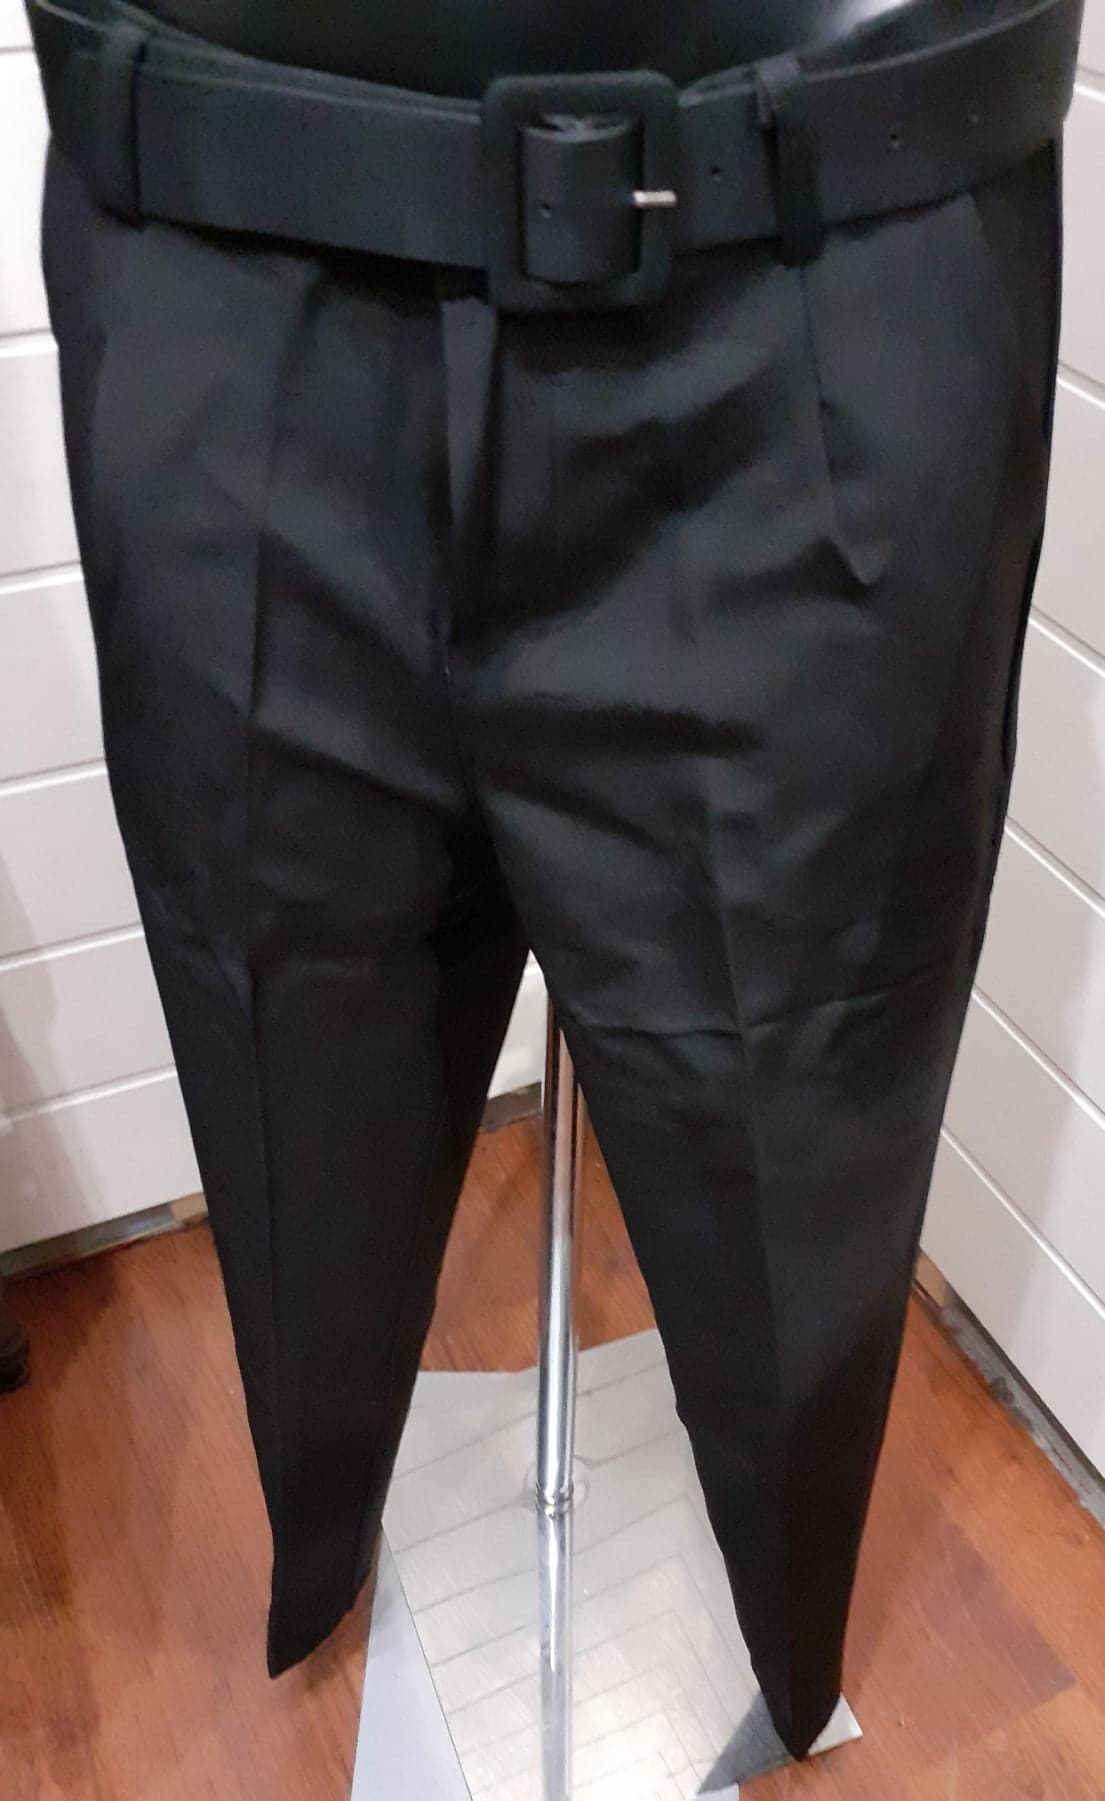 pantalon noir classic - pan-noi-cla